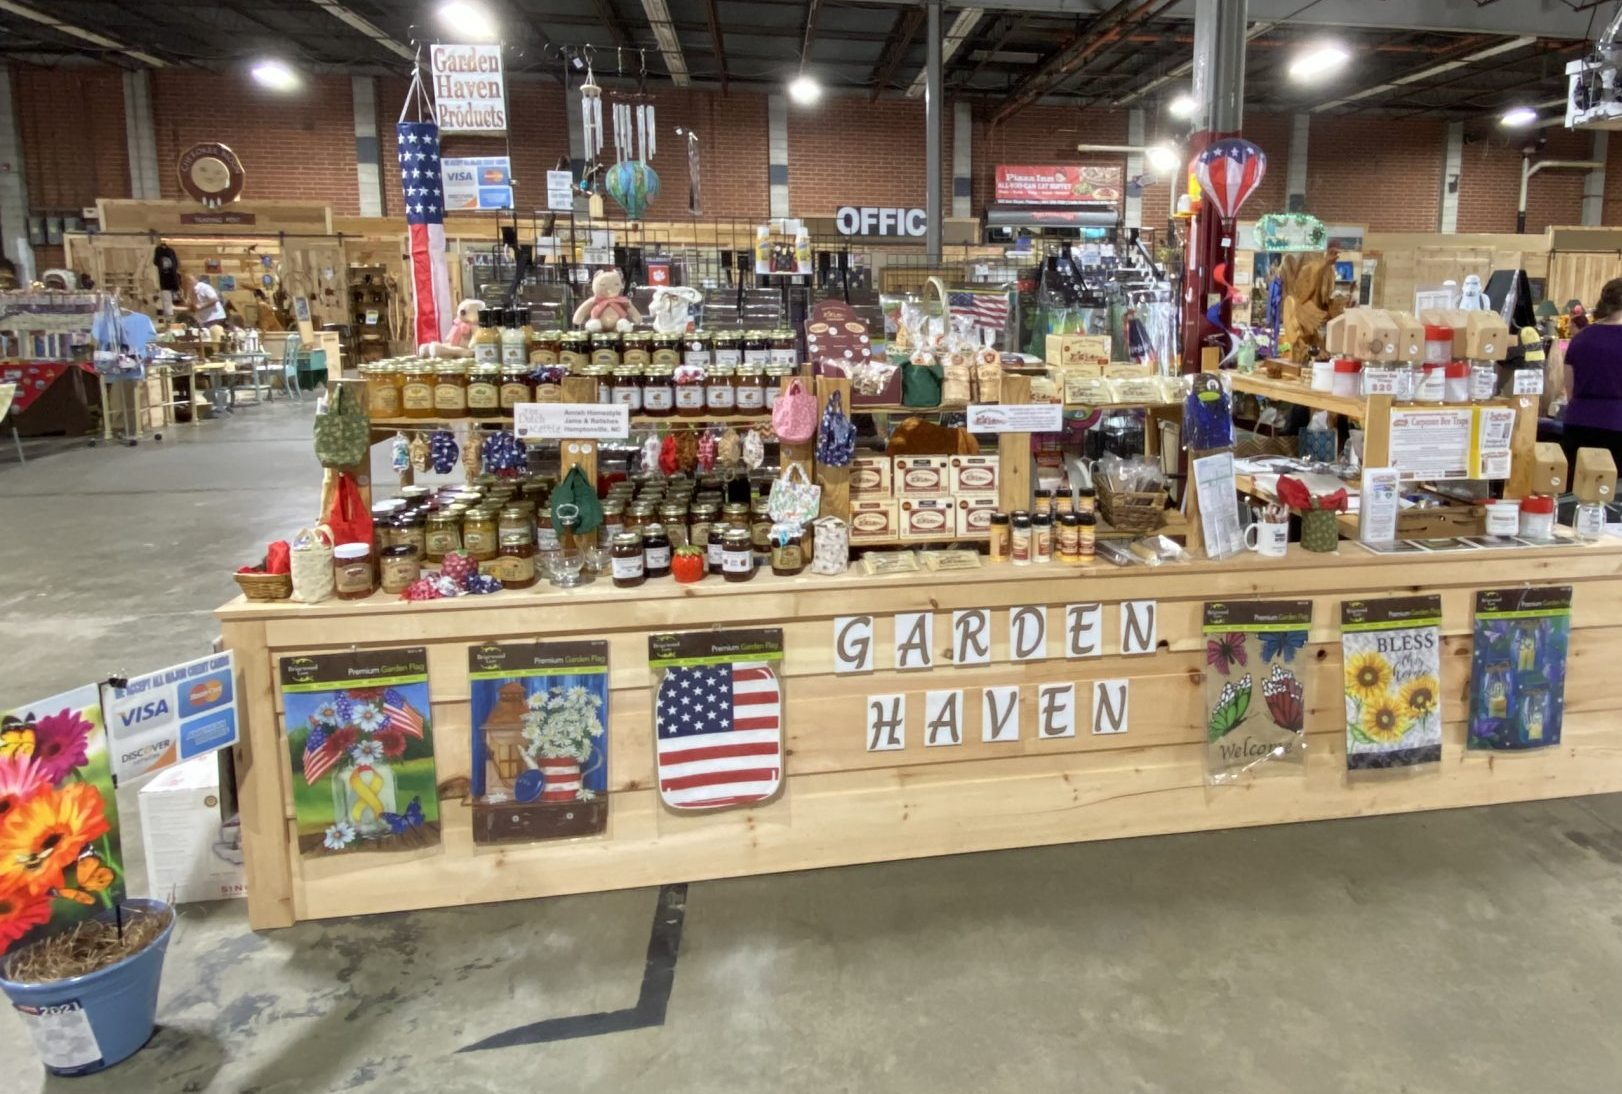 Garden Haven Products – C19